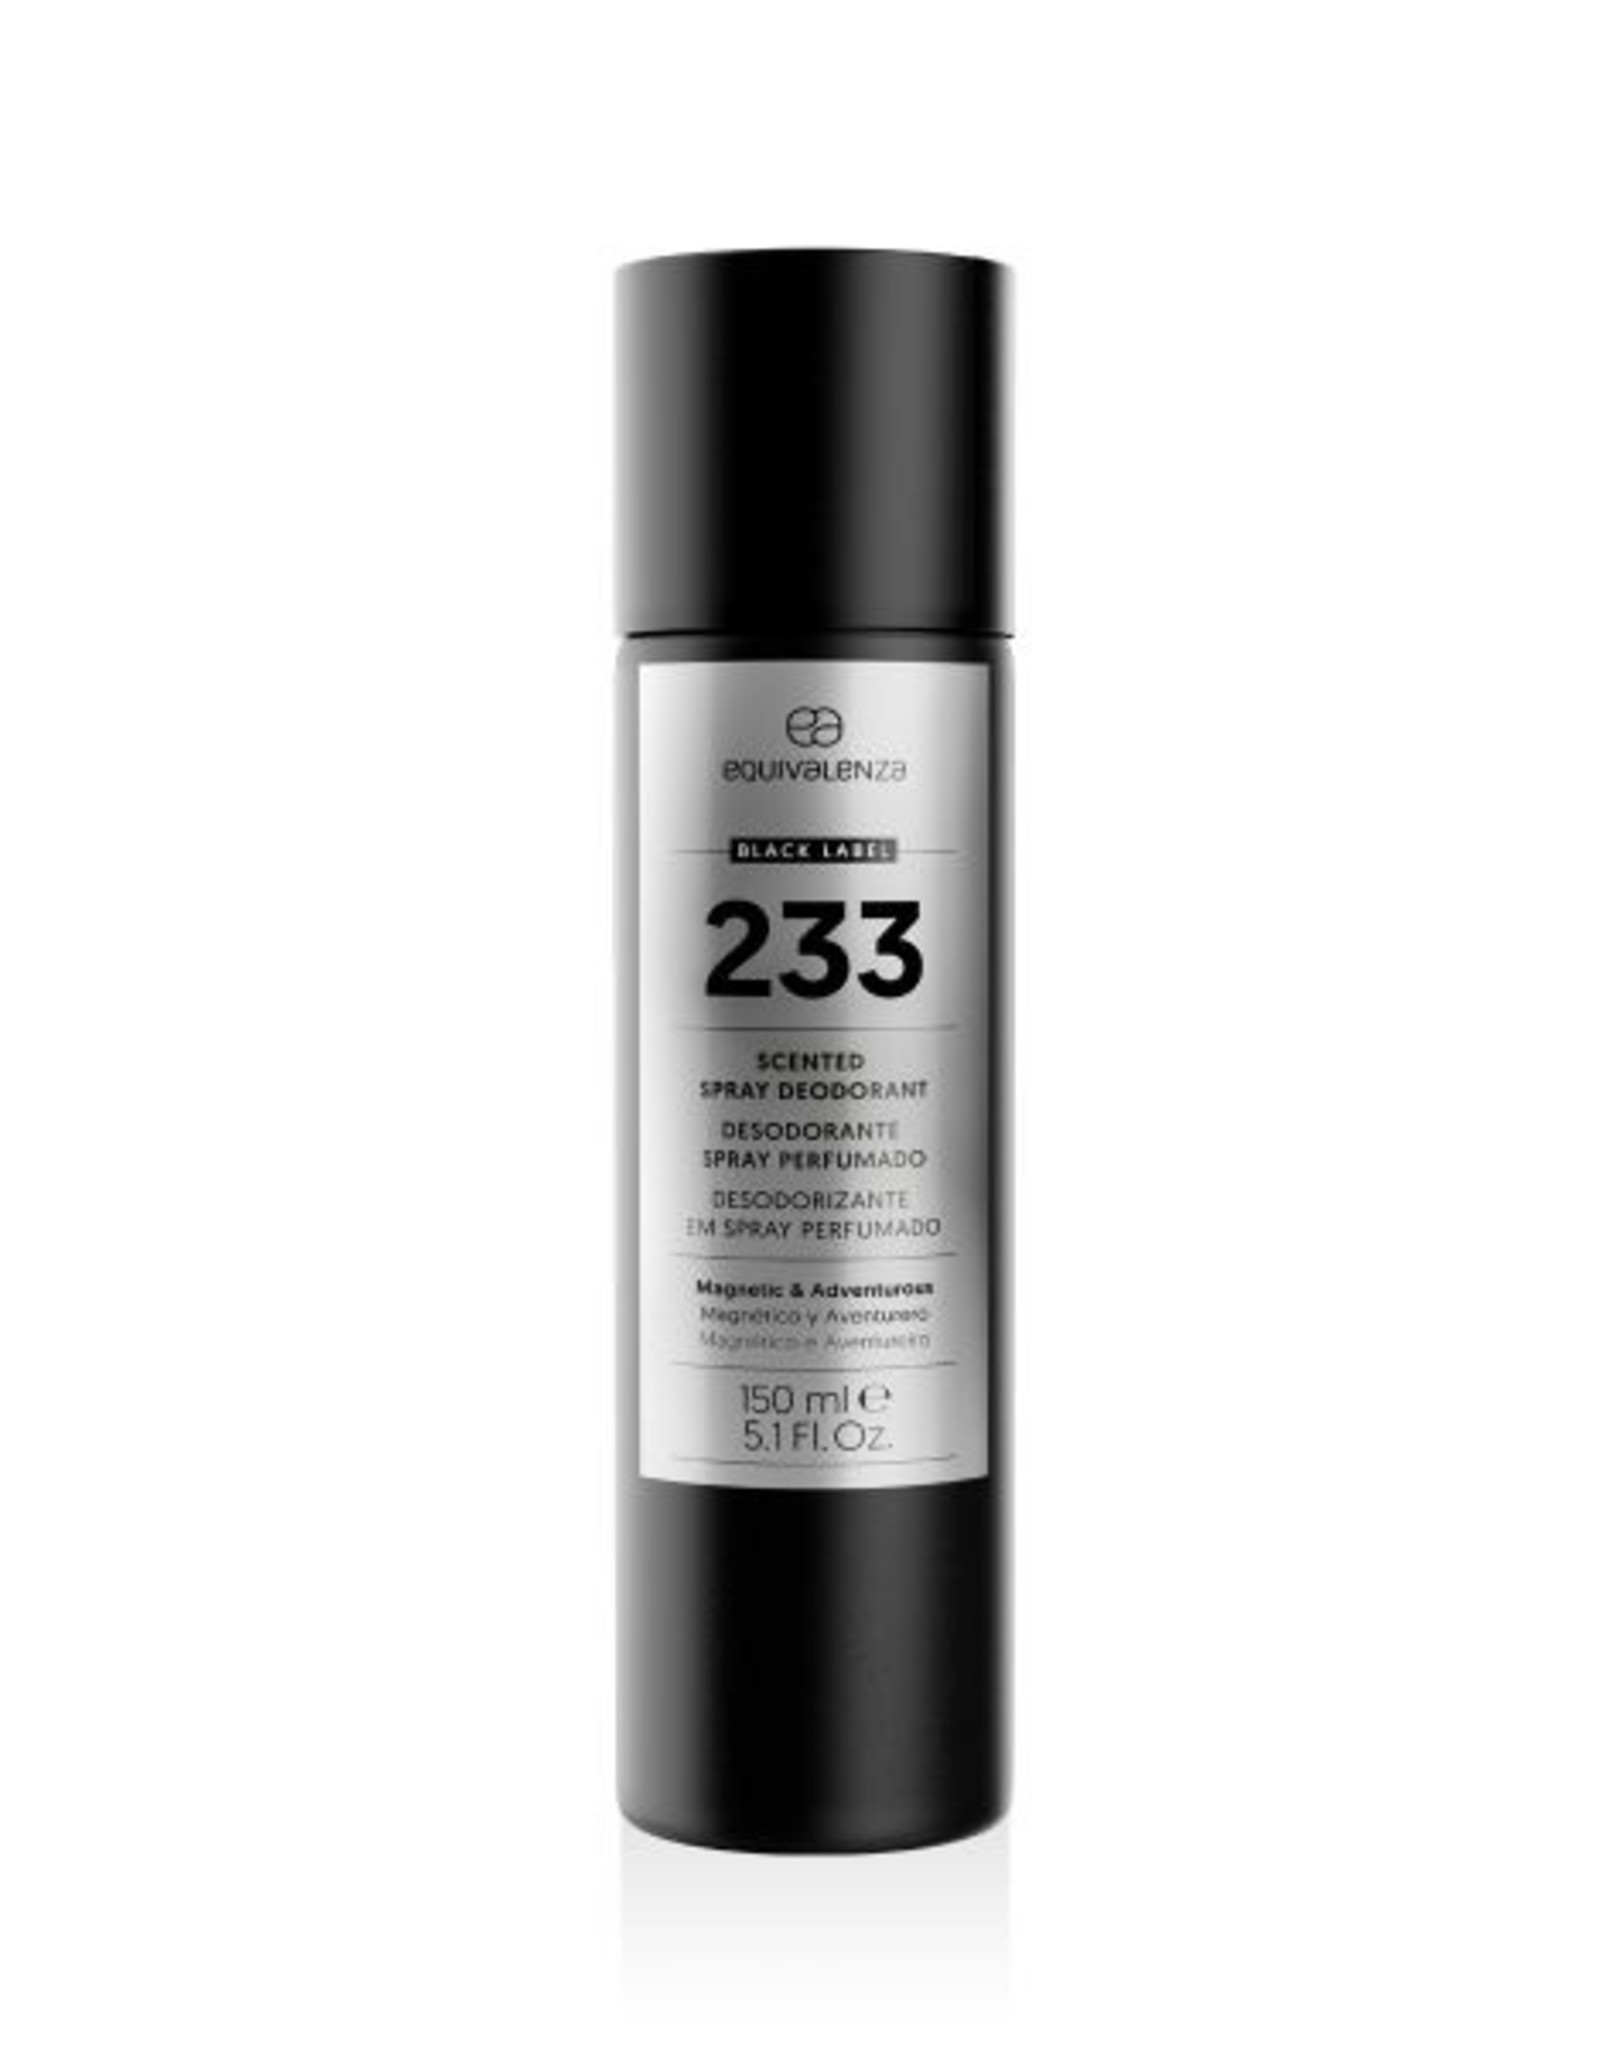 Equivalenza Black Label Deodorant 233